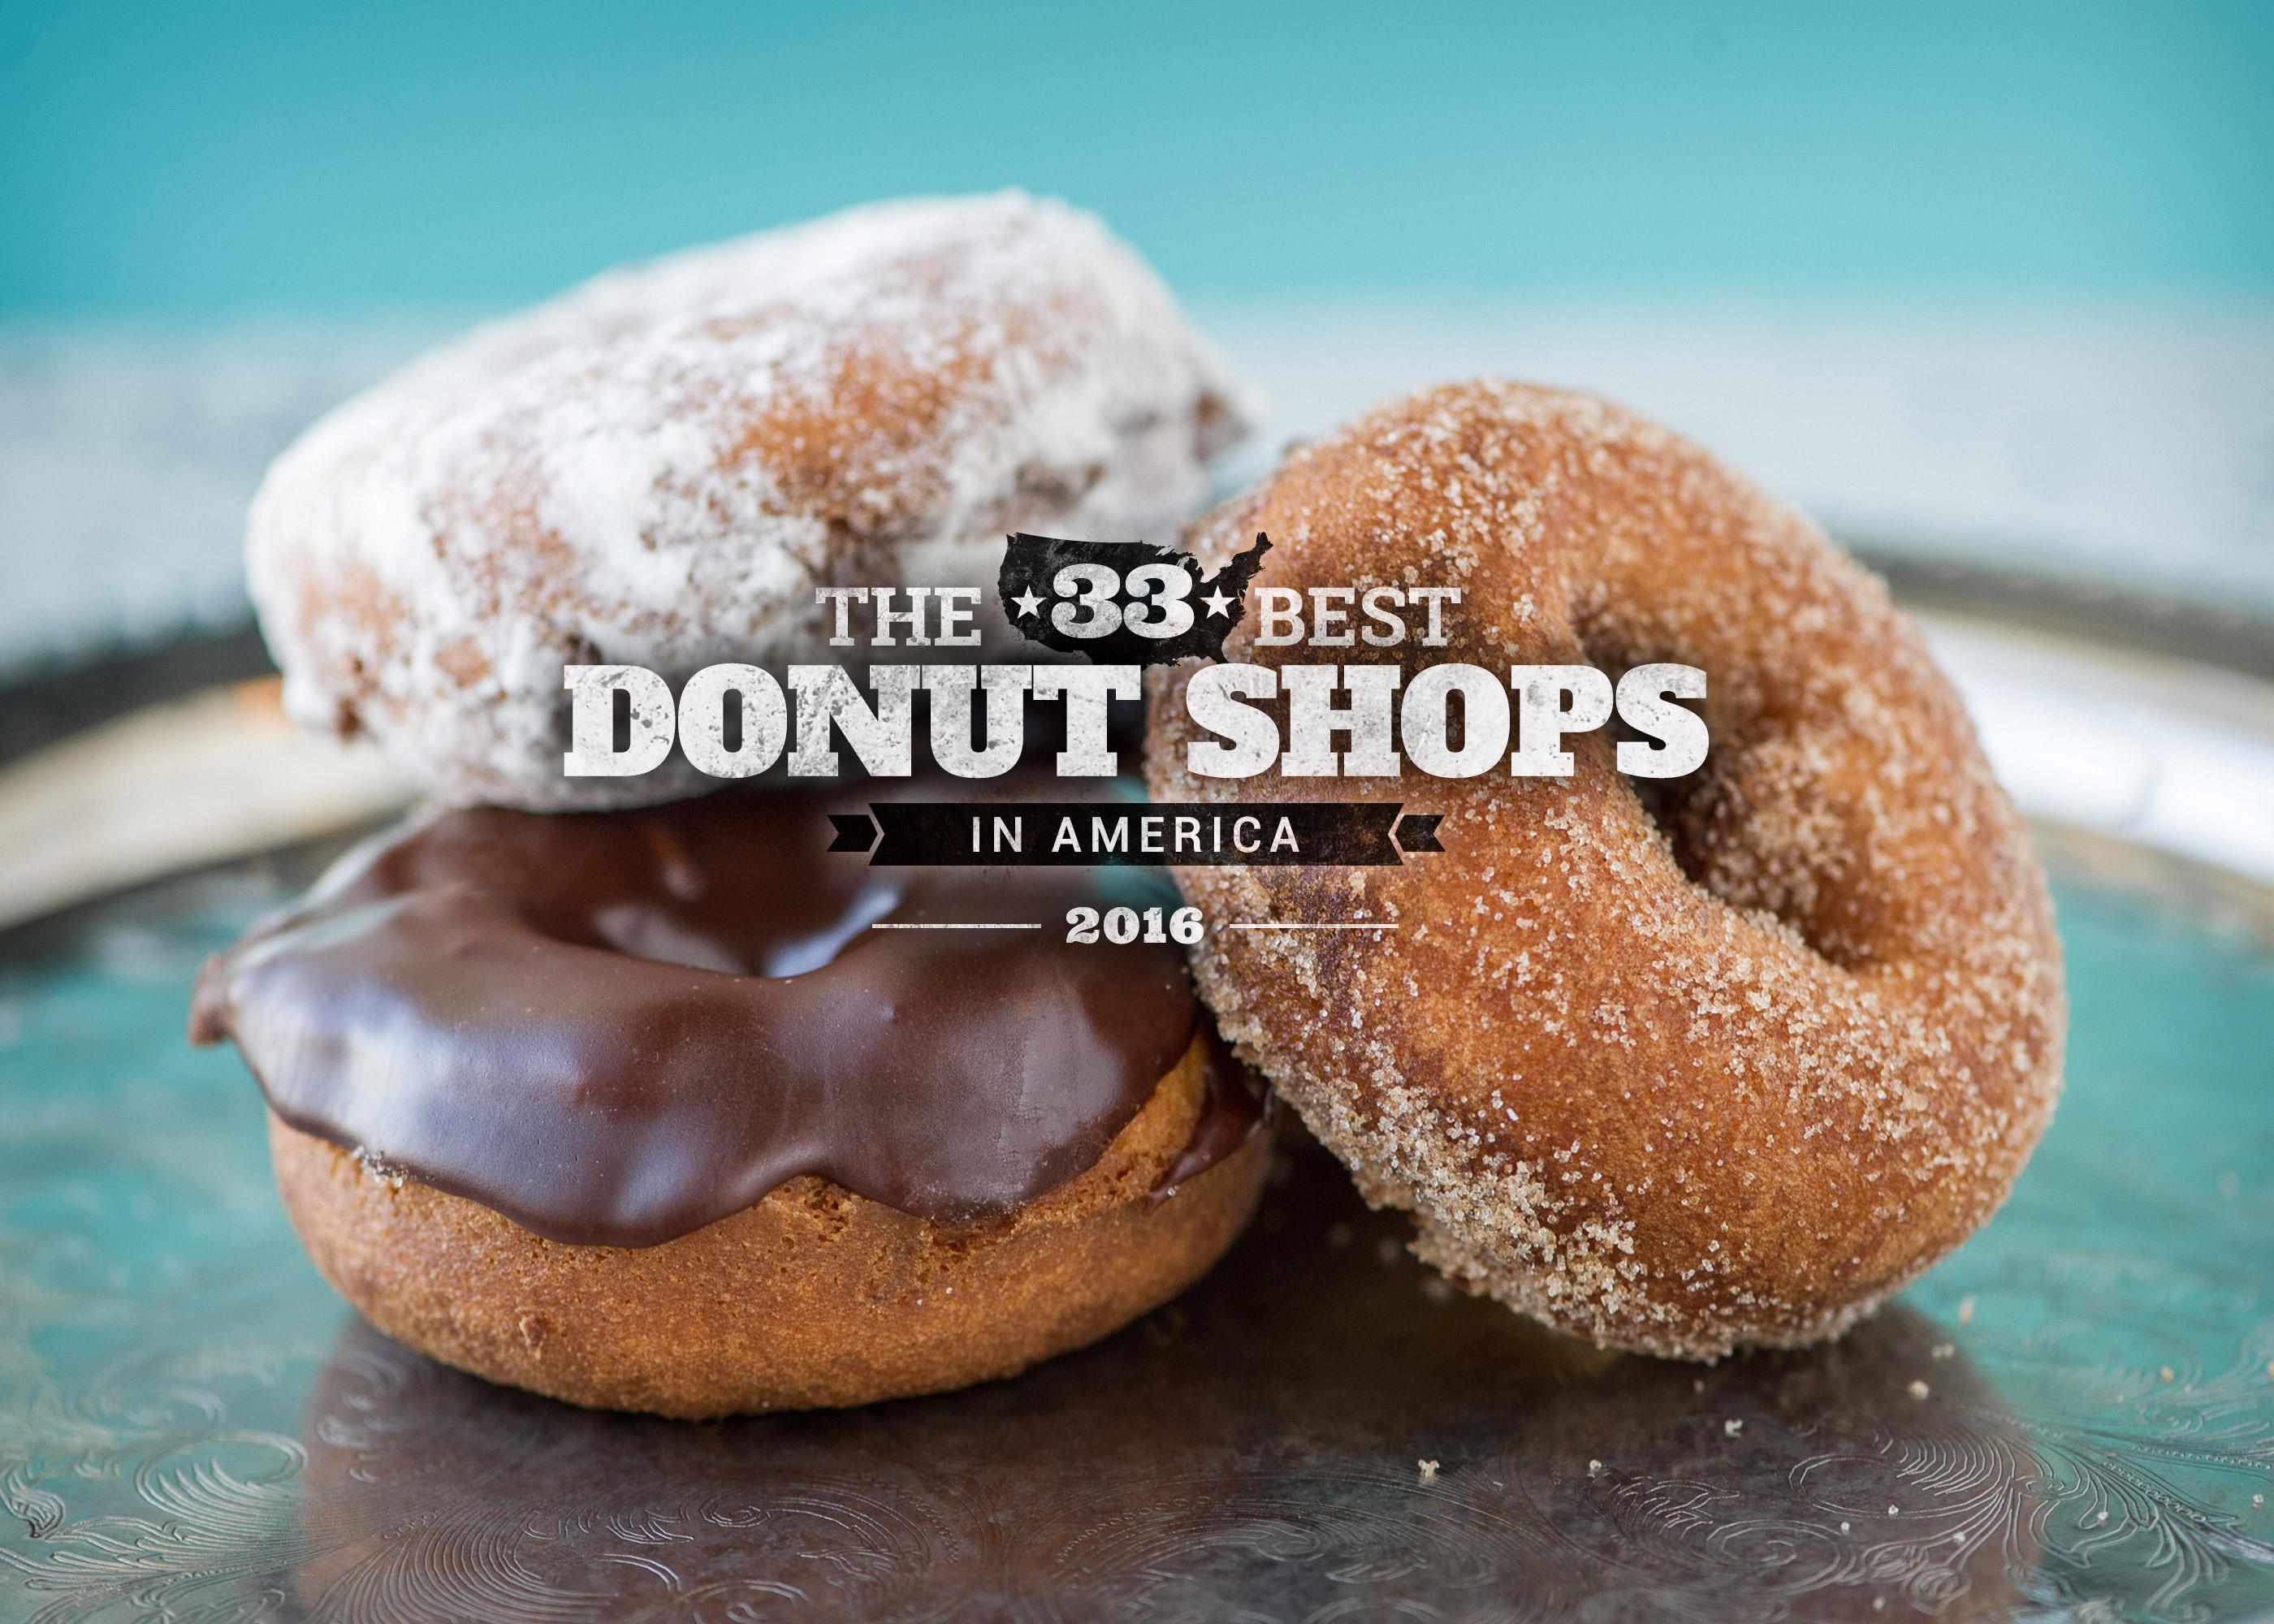 Best Donut Shops in America